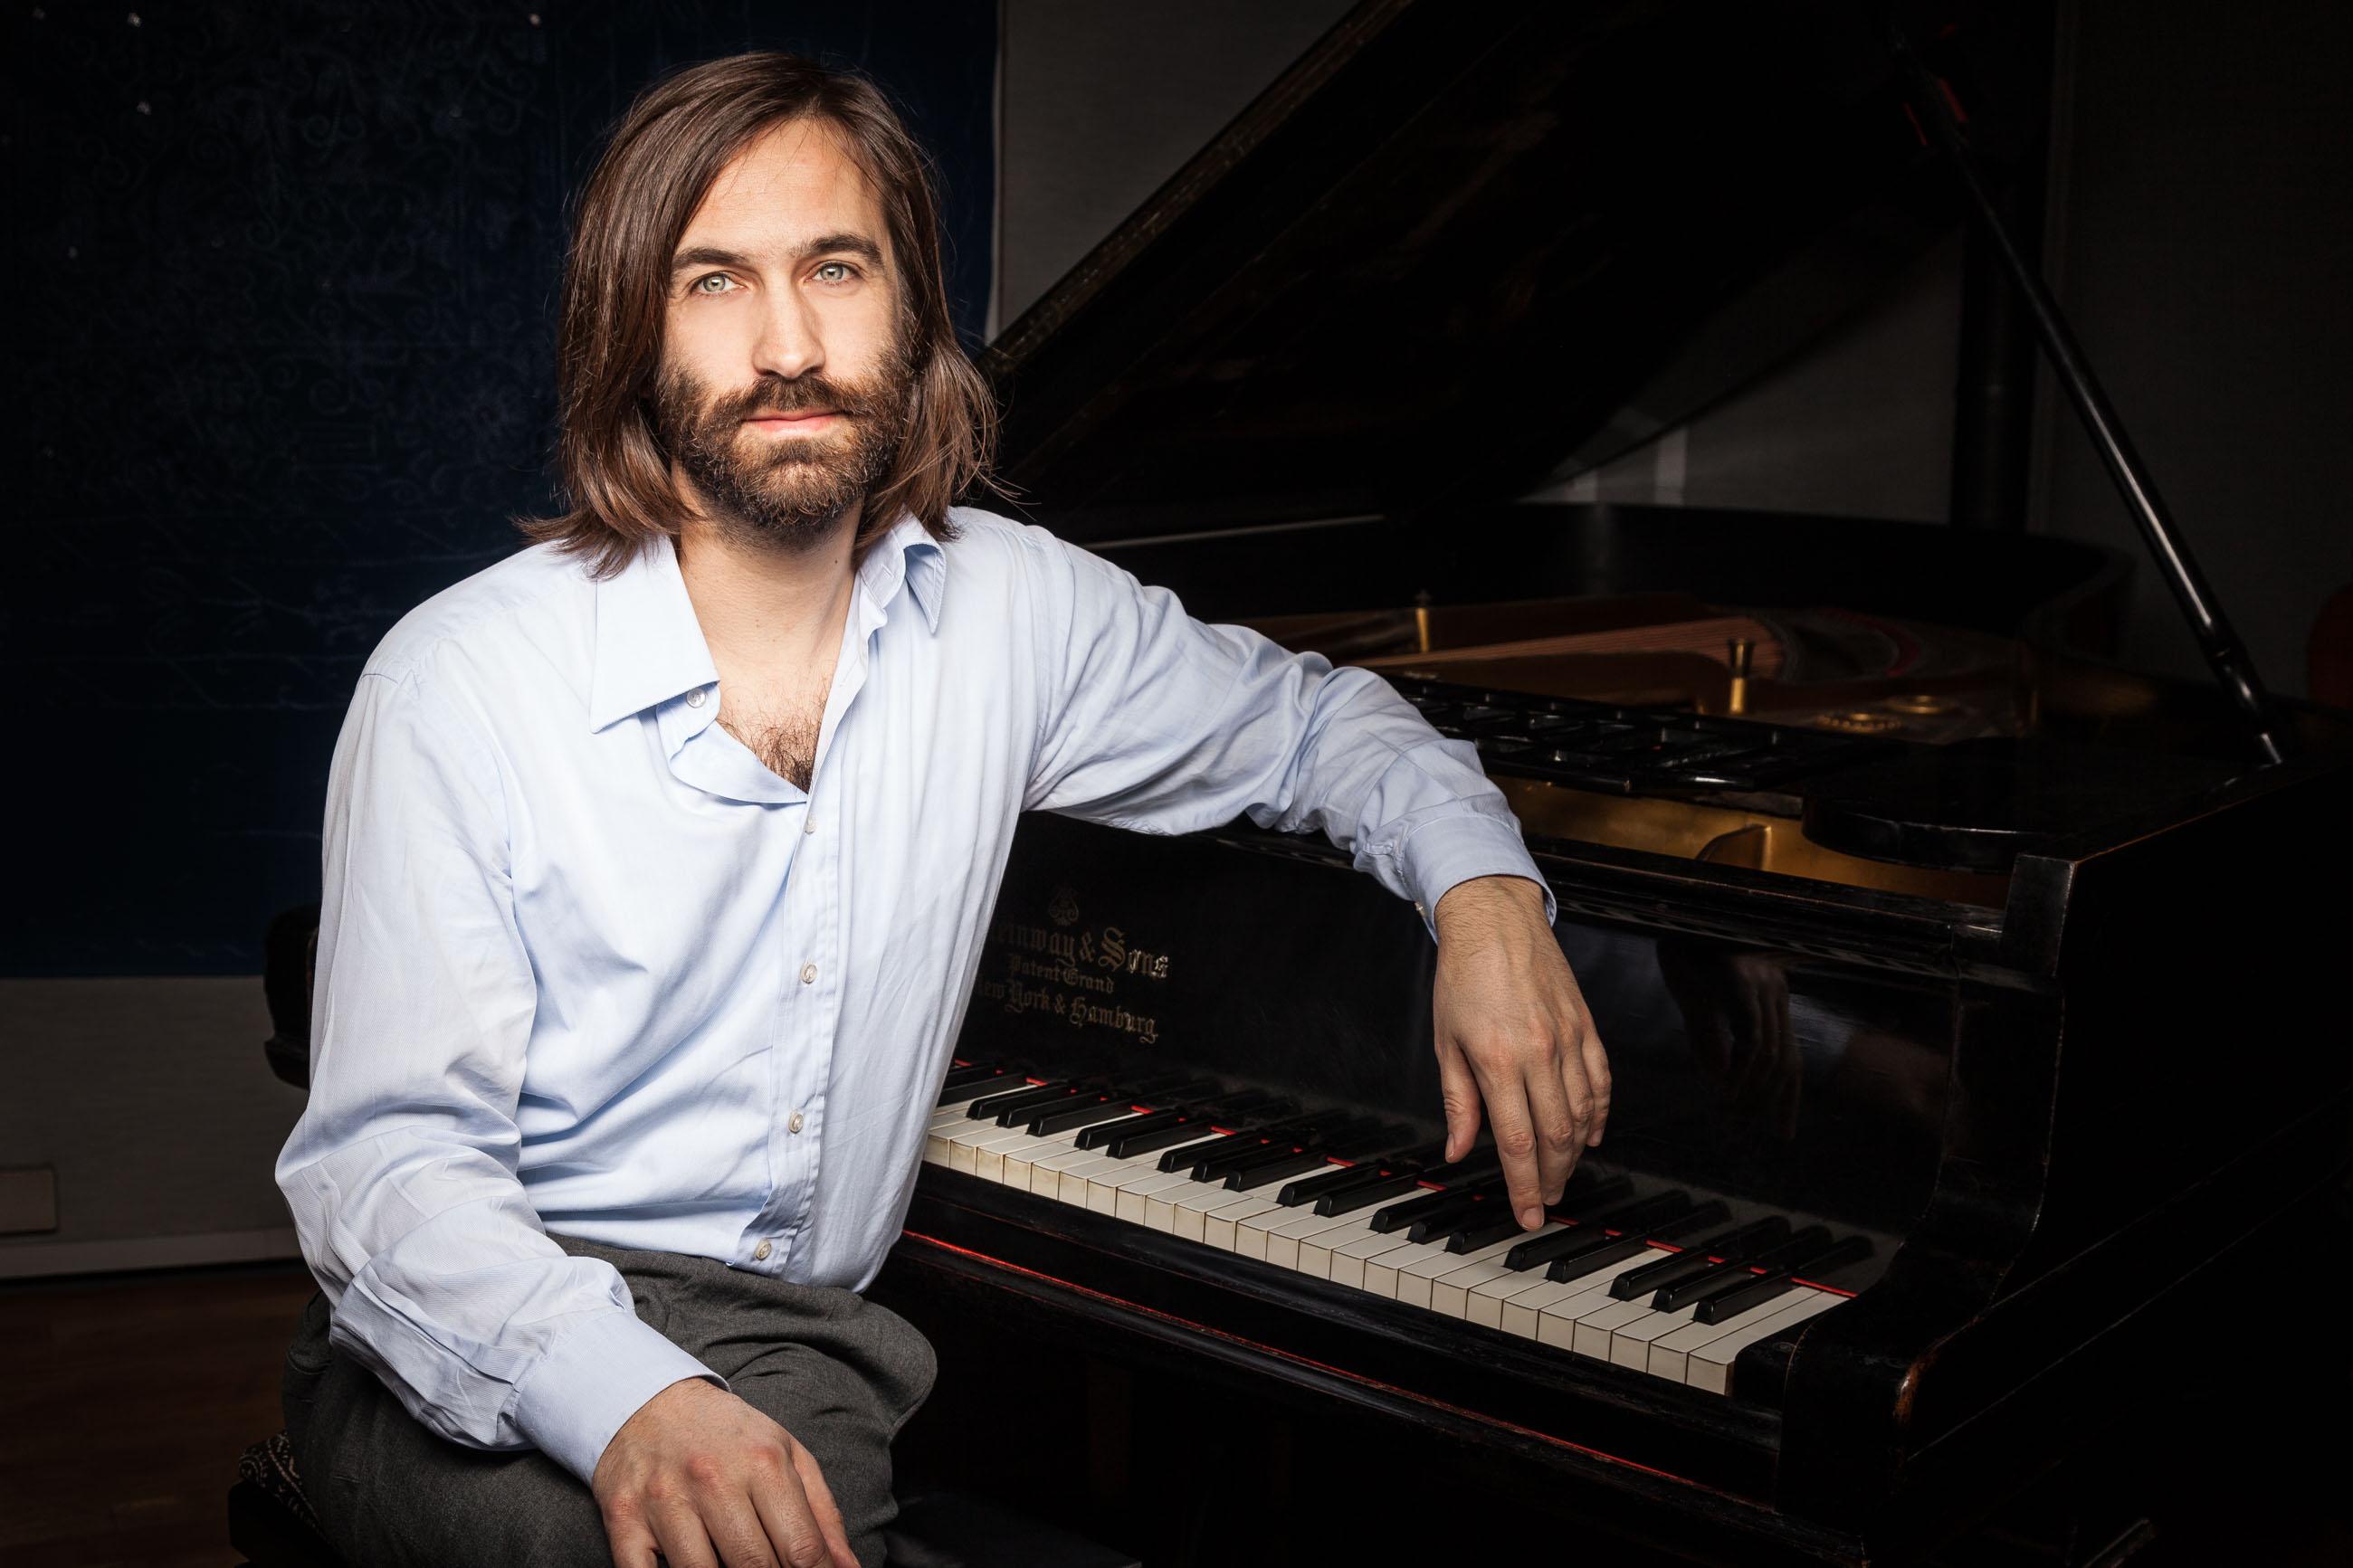 SVEN VOGEL FOTOGRAF FOTOGRAFIERTE GREGOR SCHWELLENBACH AM PIANO